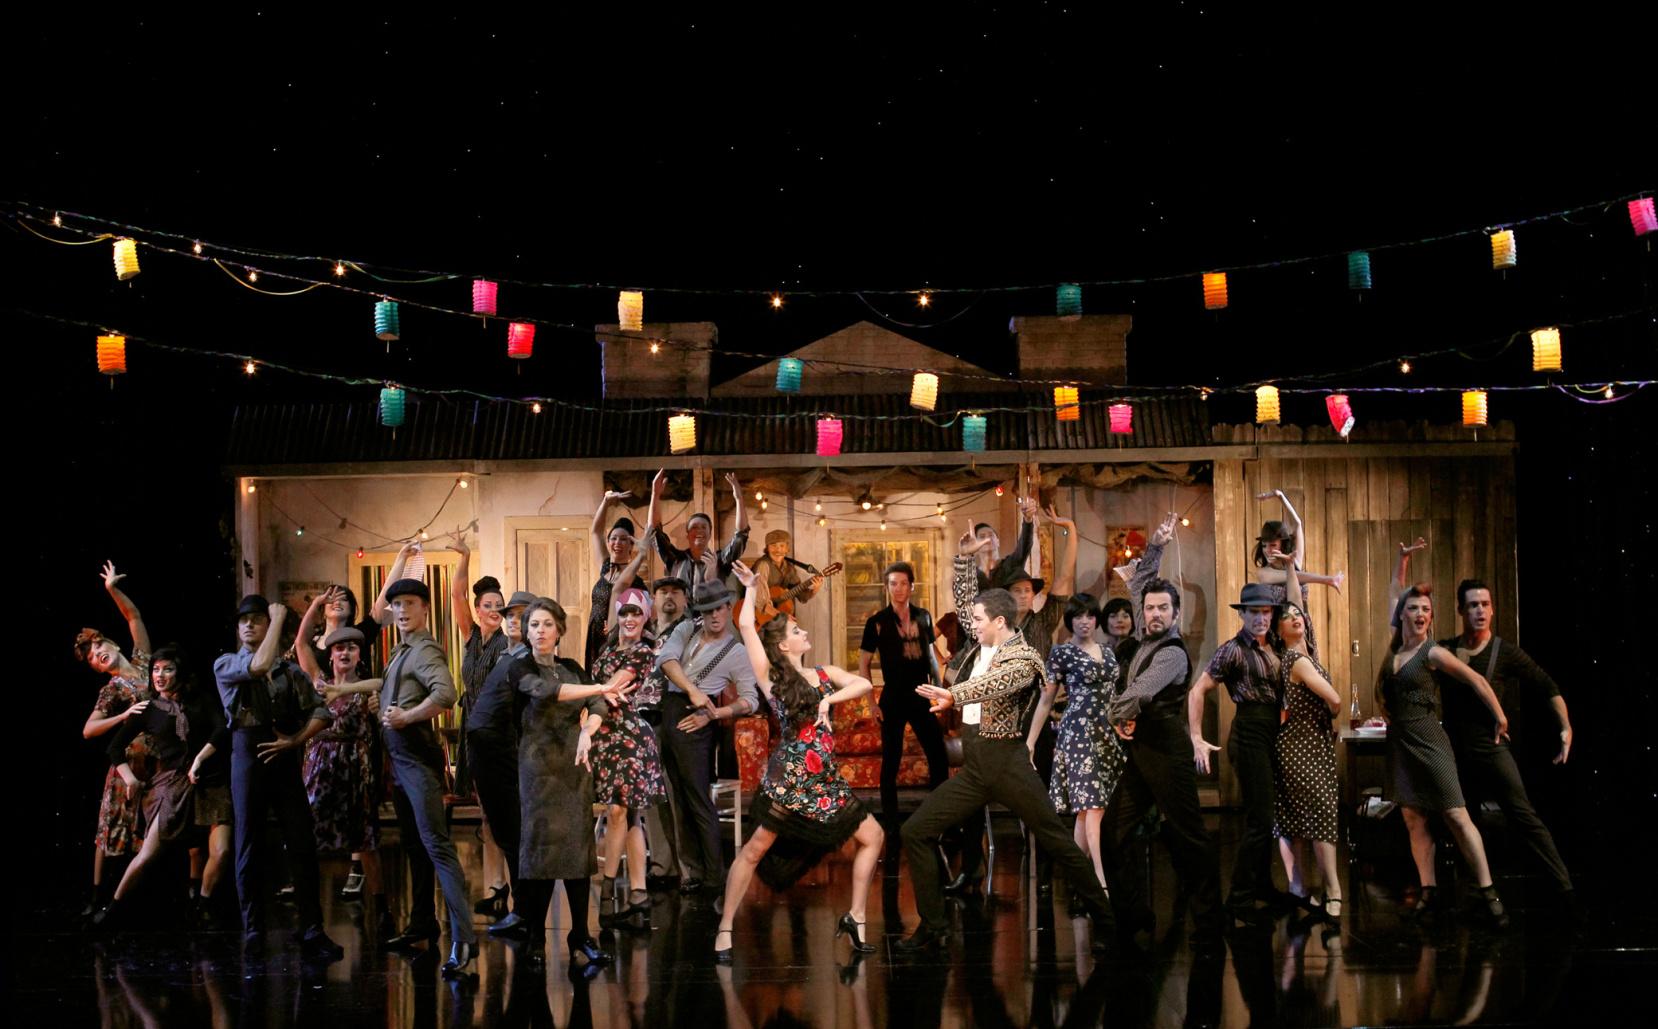 strictly-ballroom-musical-sydney-phoebe-panaretos-thomas-lacey-company.jpg